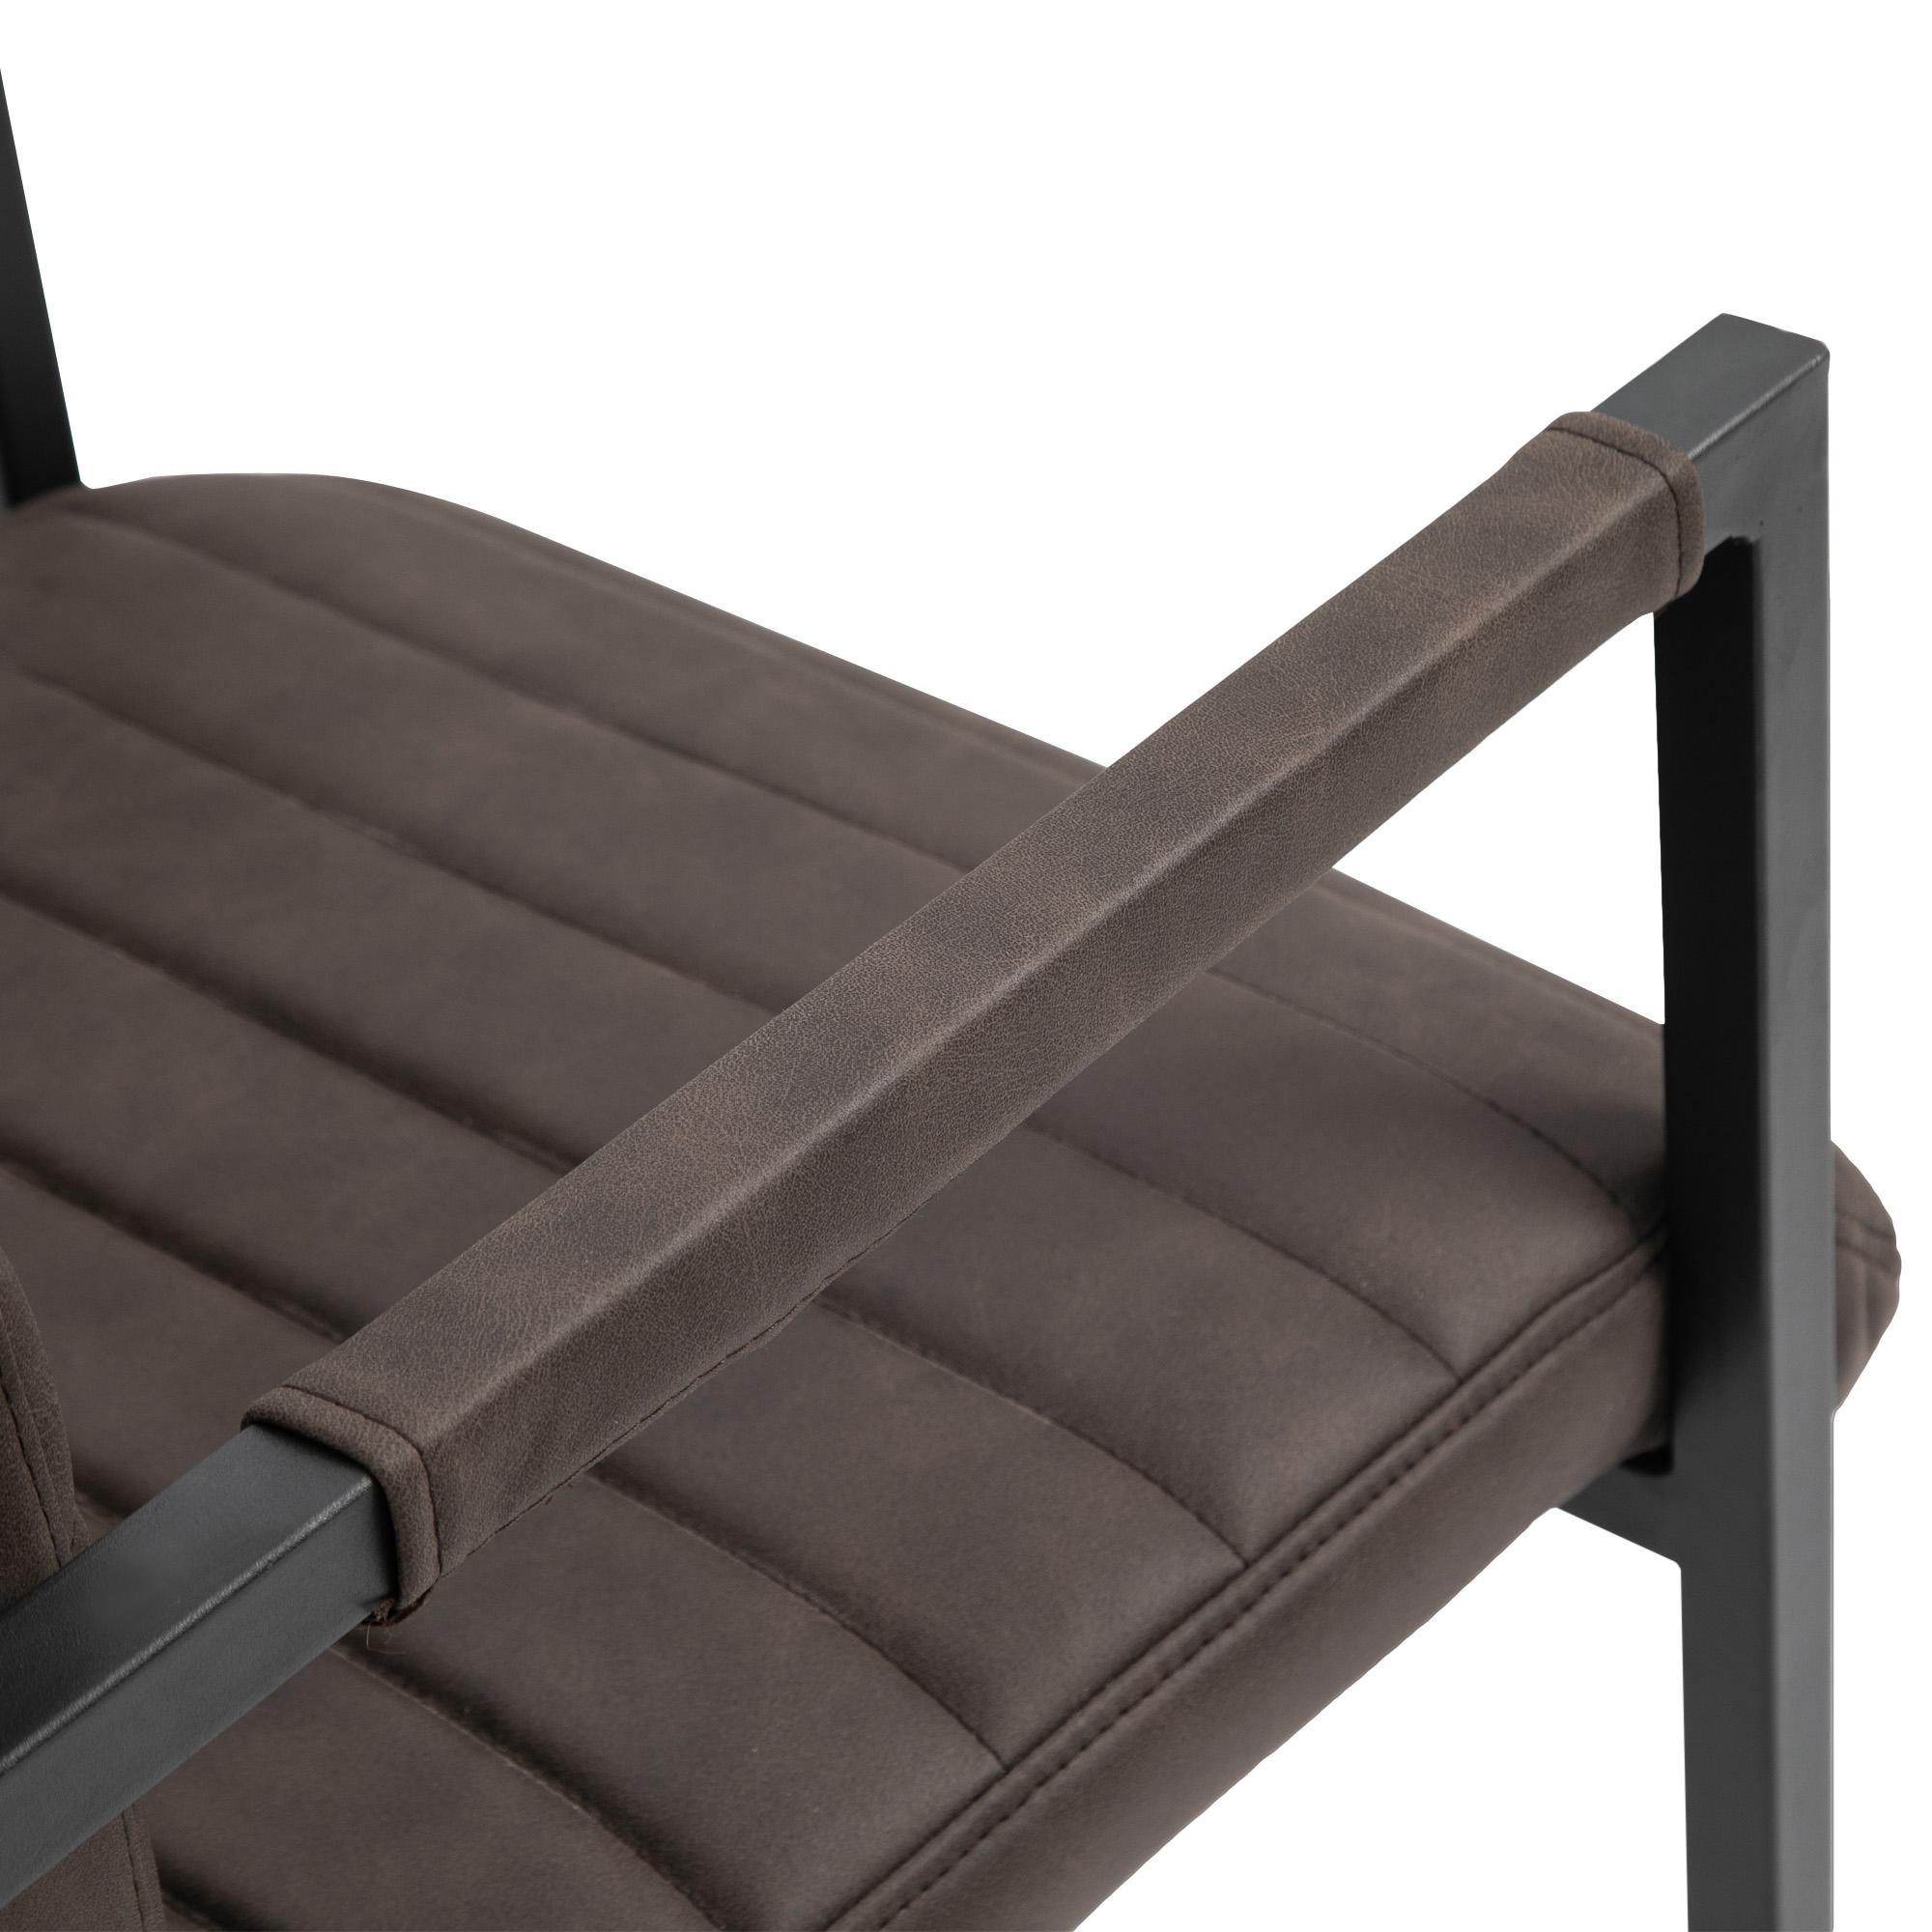 Marroni 63x53x90cm homcom Set di 2 Sedie da Pranzo Moderne in Stile Industriale con Imbottitura e Braccioli